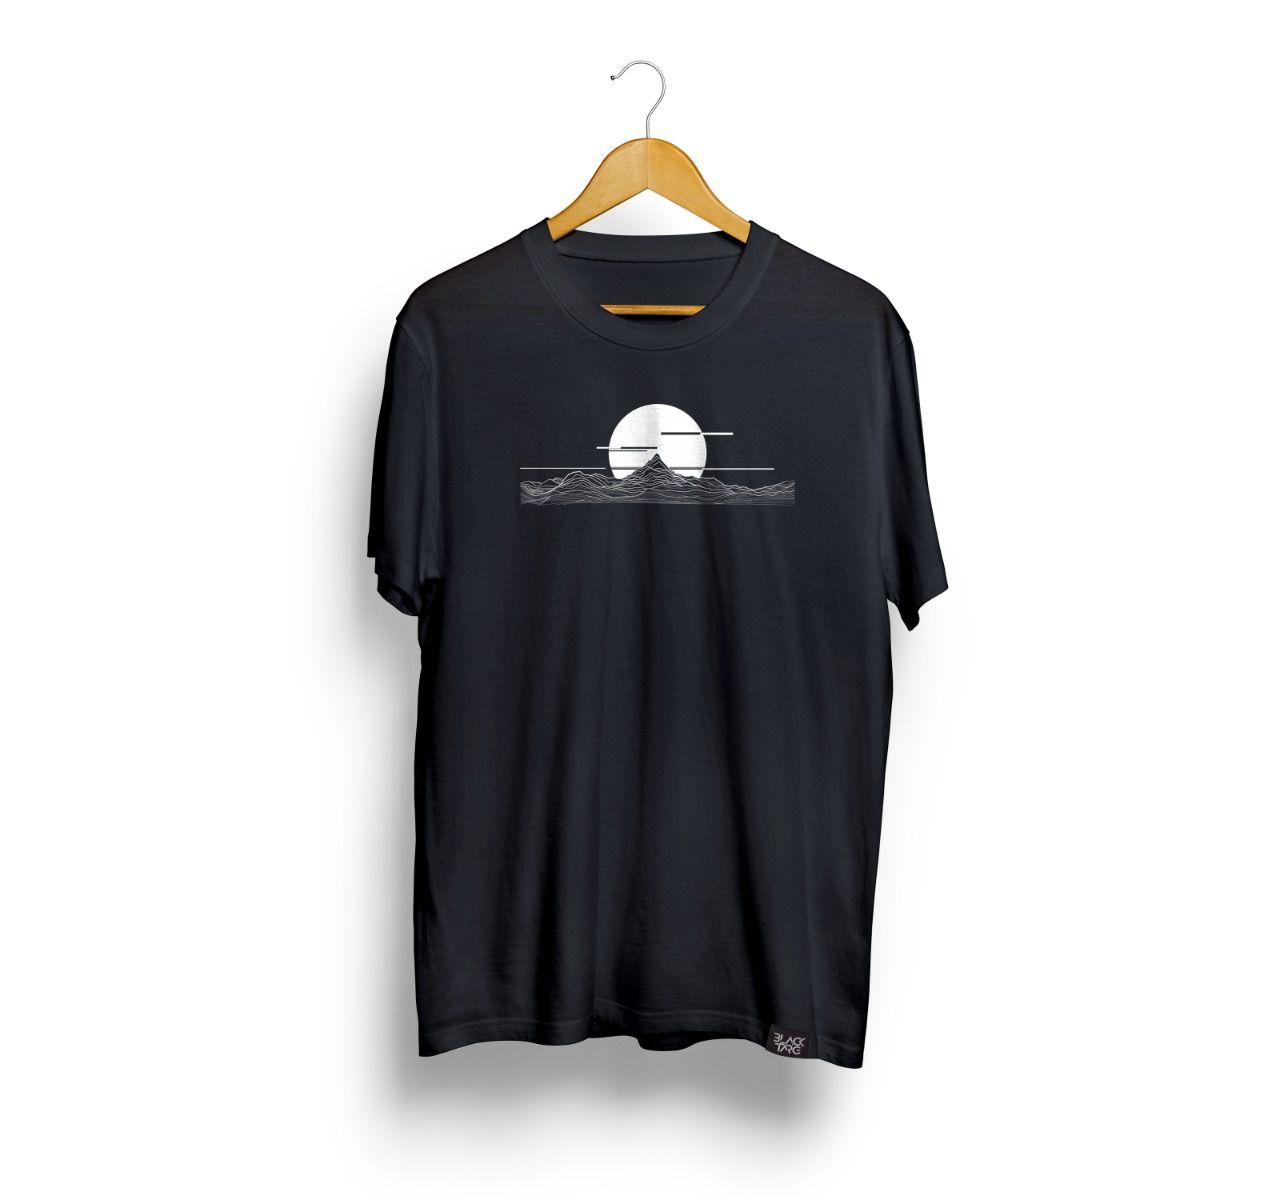 Camiseta Masculina Estampada Eclipse Preta